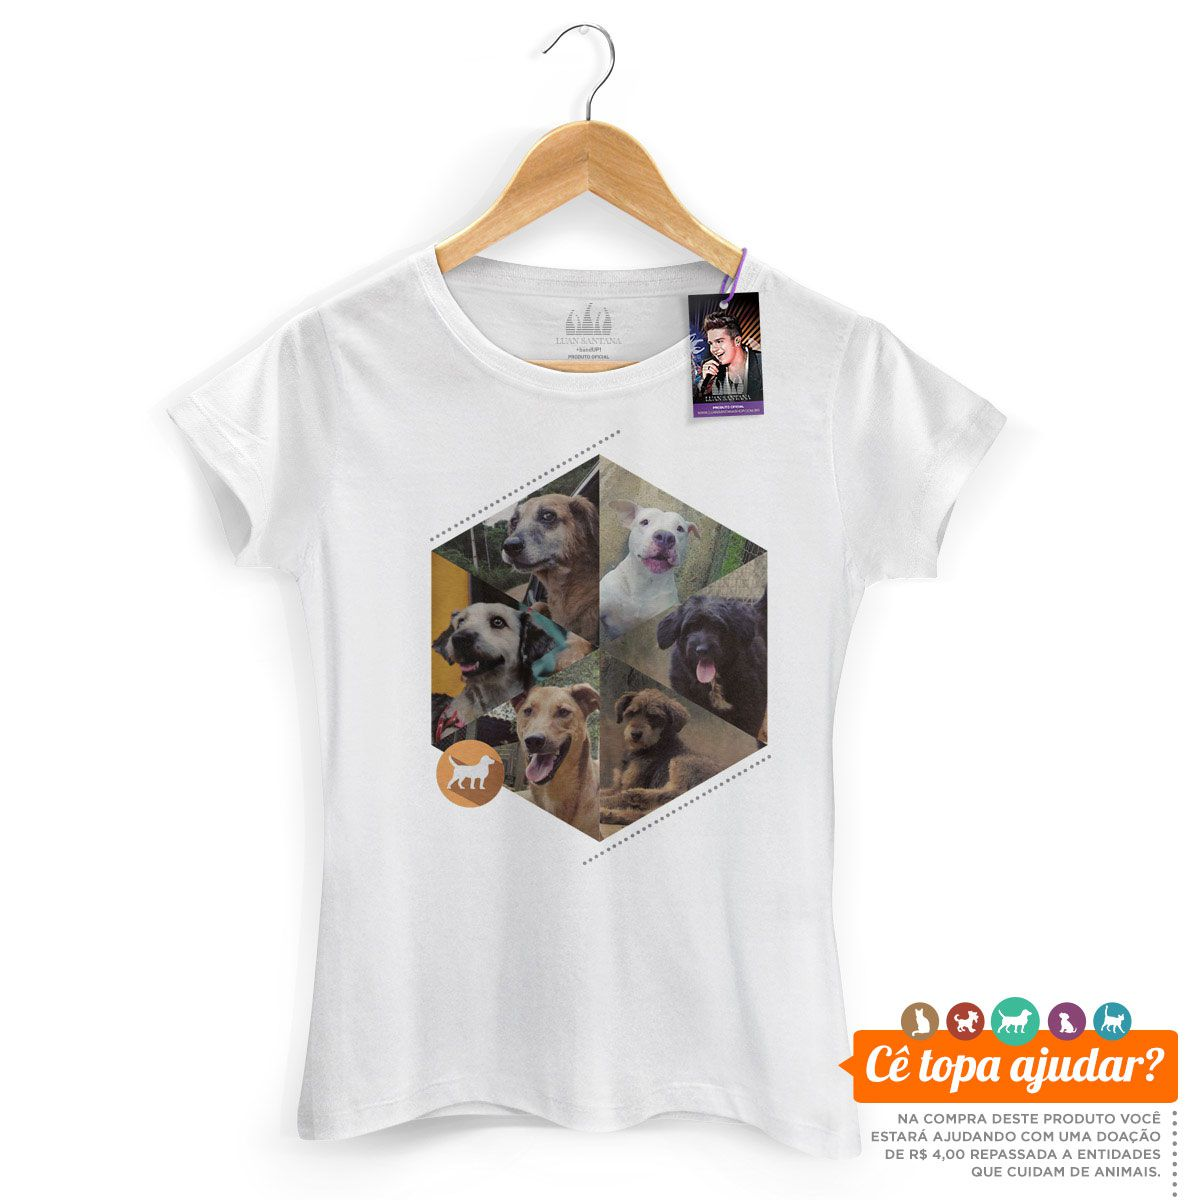 Camiseta Feminina Luan Santana Cê Topa Cuidar da Gente?